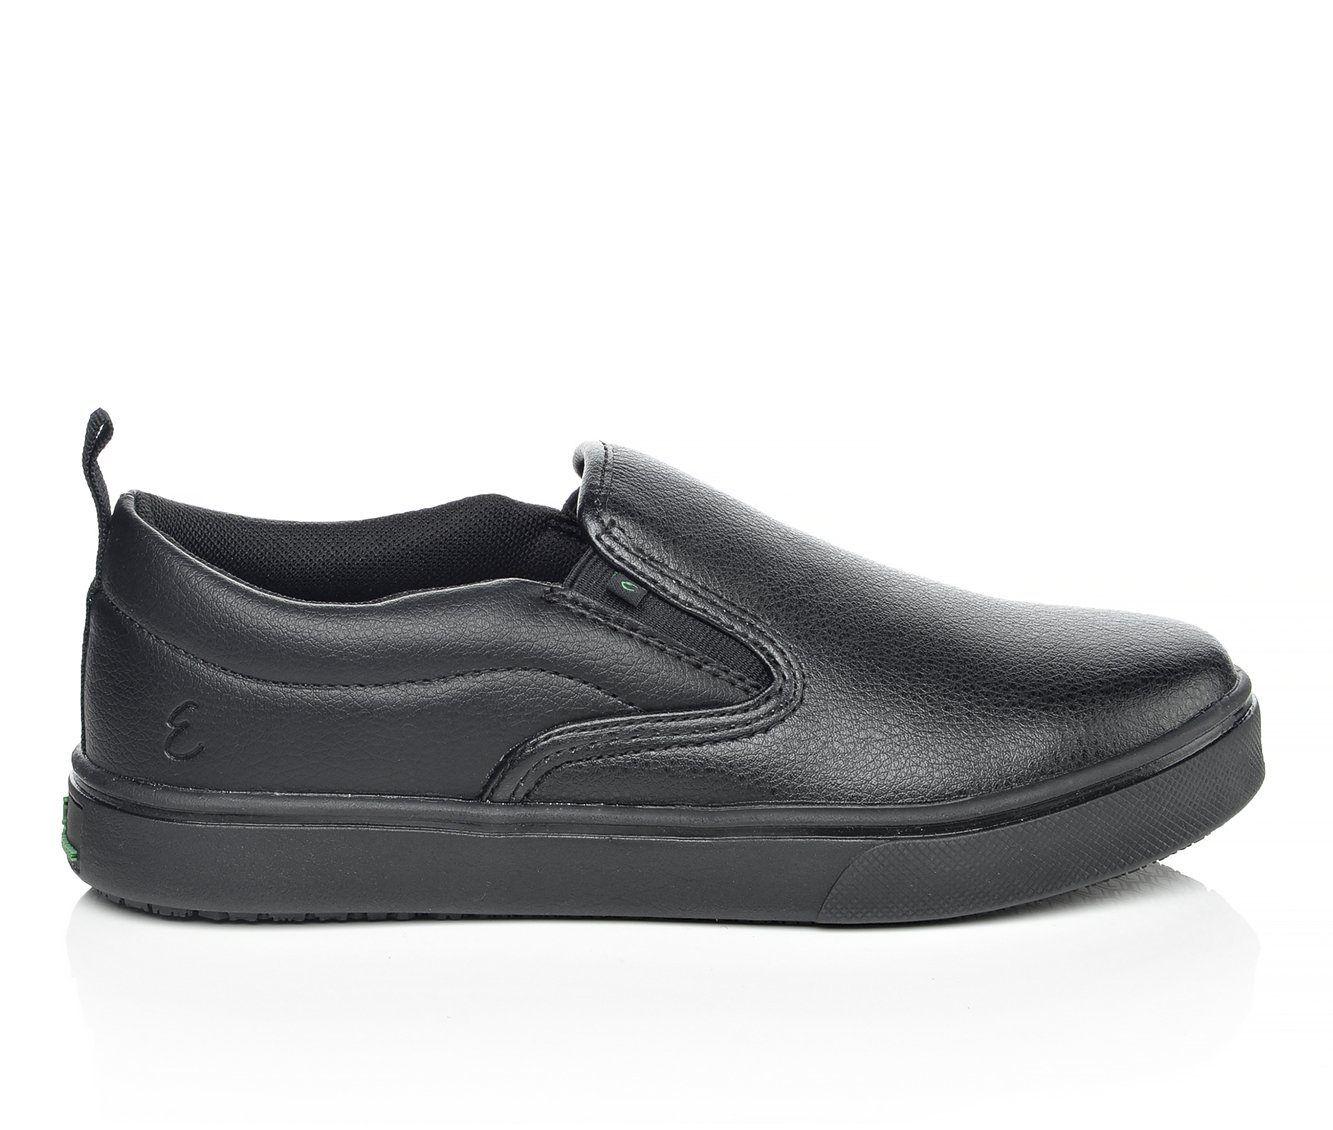 Women's Emeril Lagasse Royal Ladies Slip Resistant Shoes Black Leather